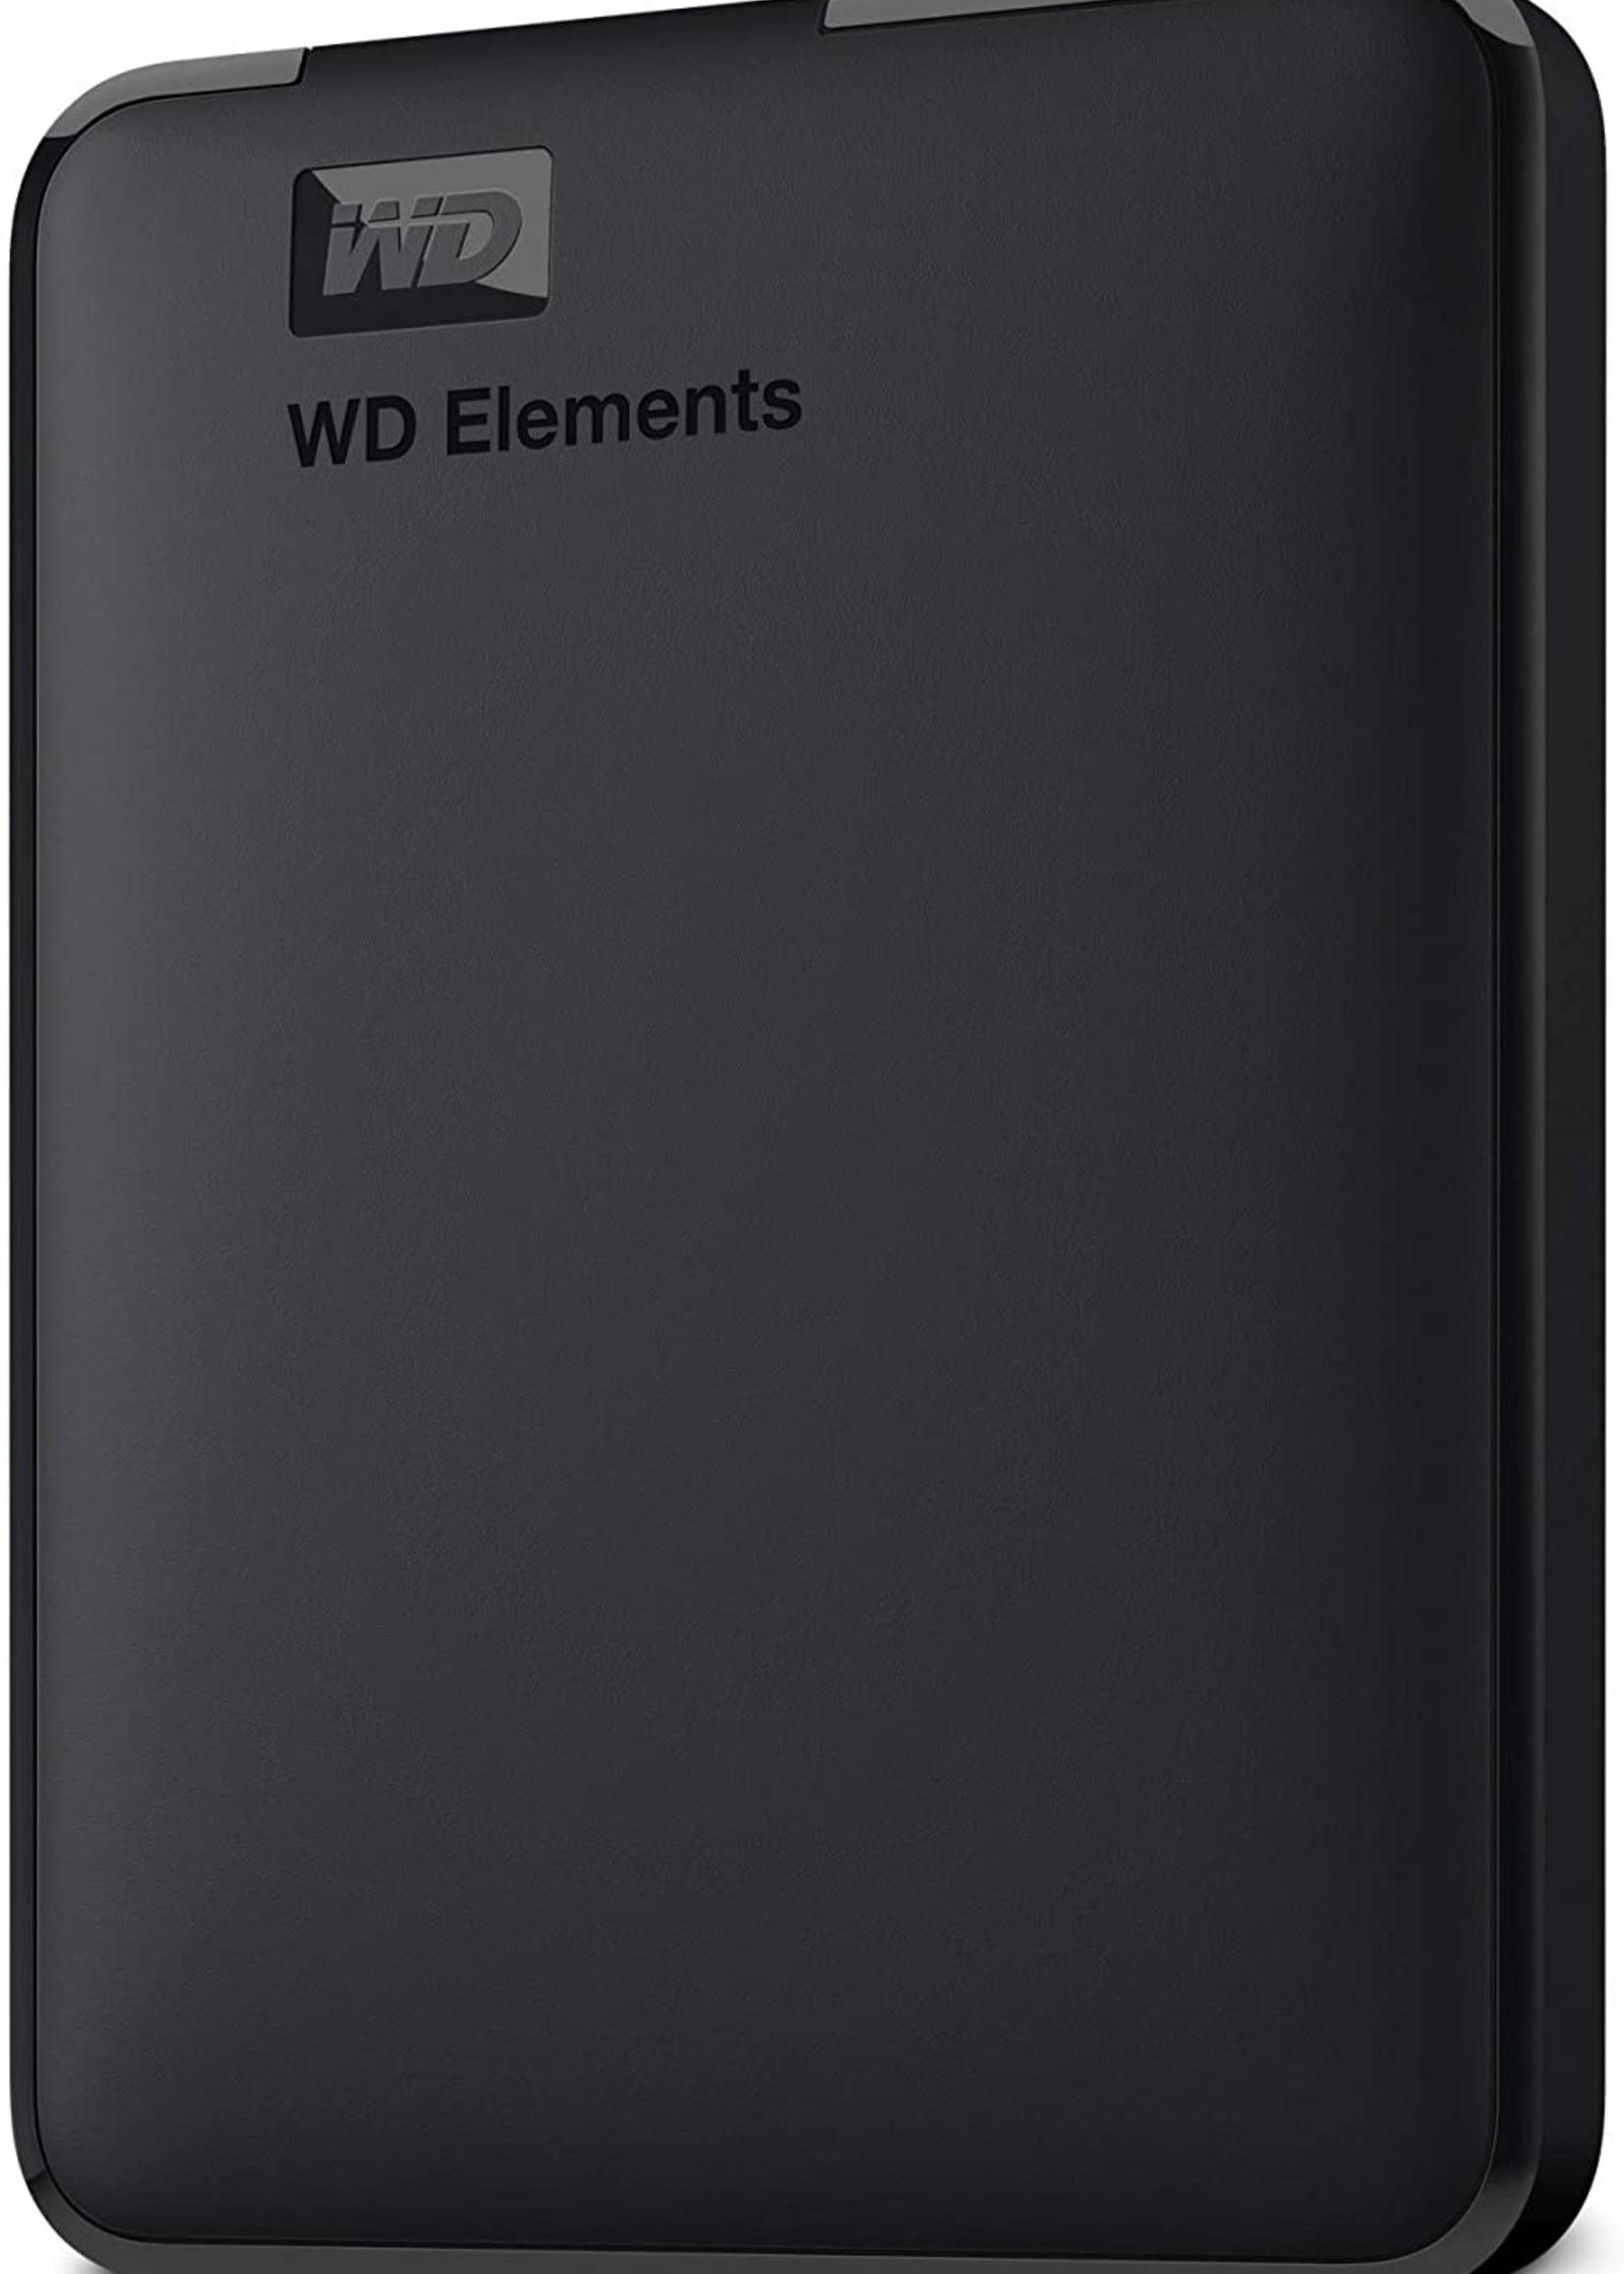 Western Digital 5TB WD Elements External USB 3.0 HHD